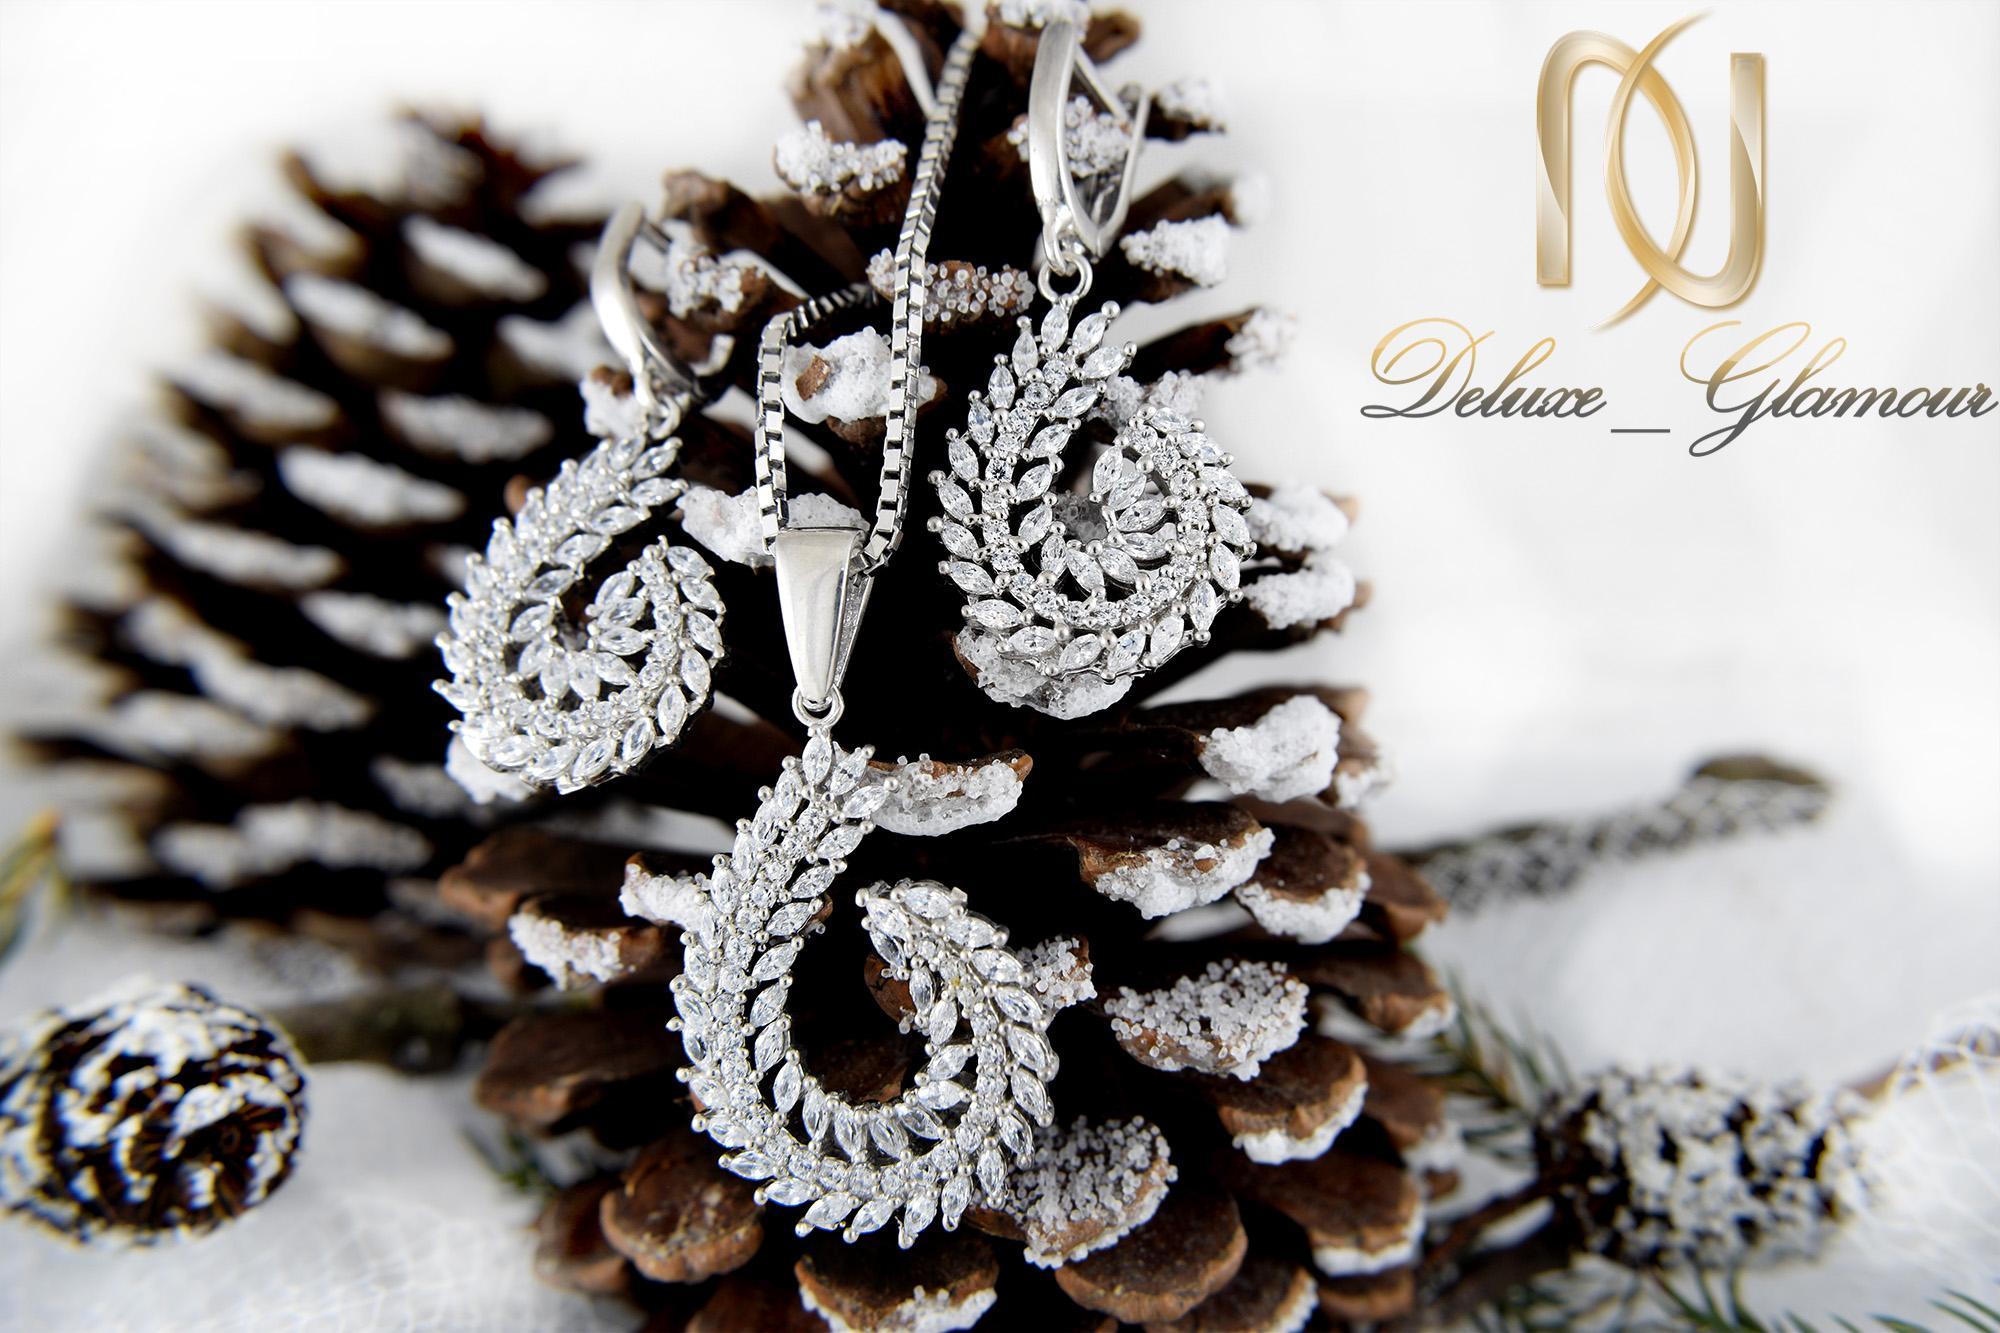 نیم ست جواهری نقره طرح خوشه Ds-n333 طرح زمستانی